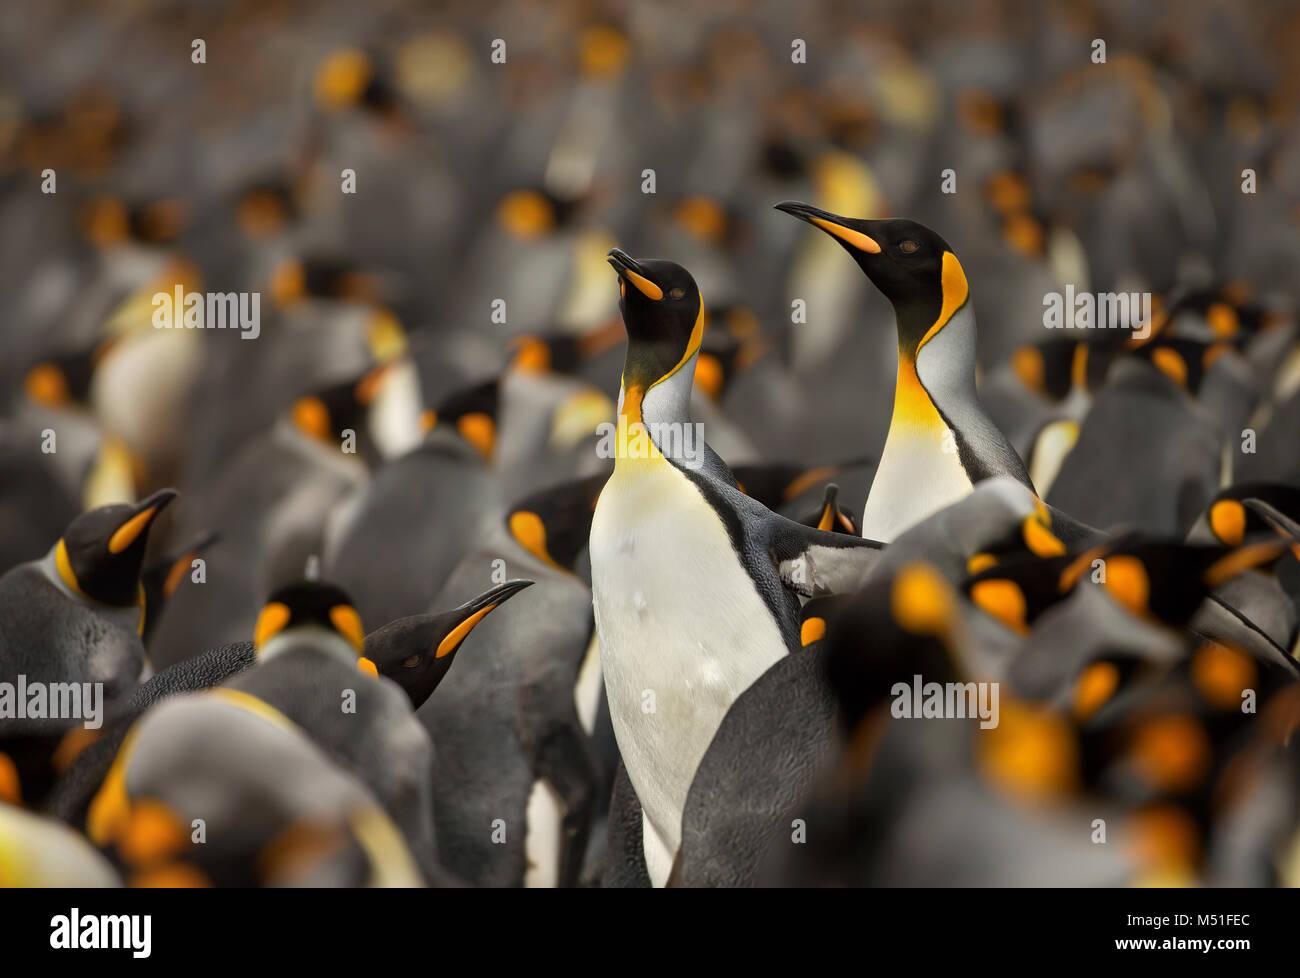 Königspinguin (Aptenodytes patagonicus) Kolonie in der Falkland Inseln. Stockbild